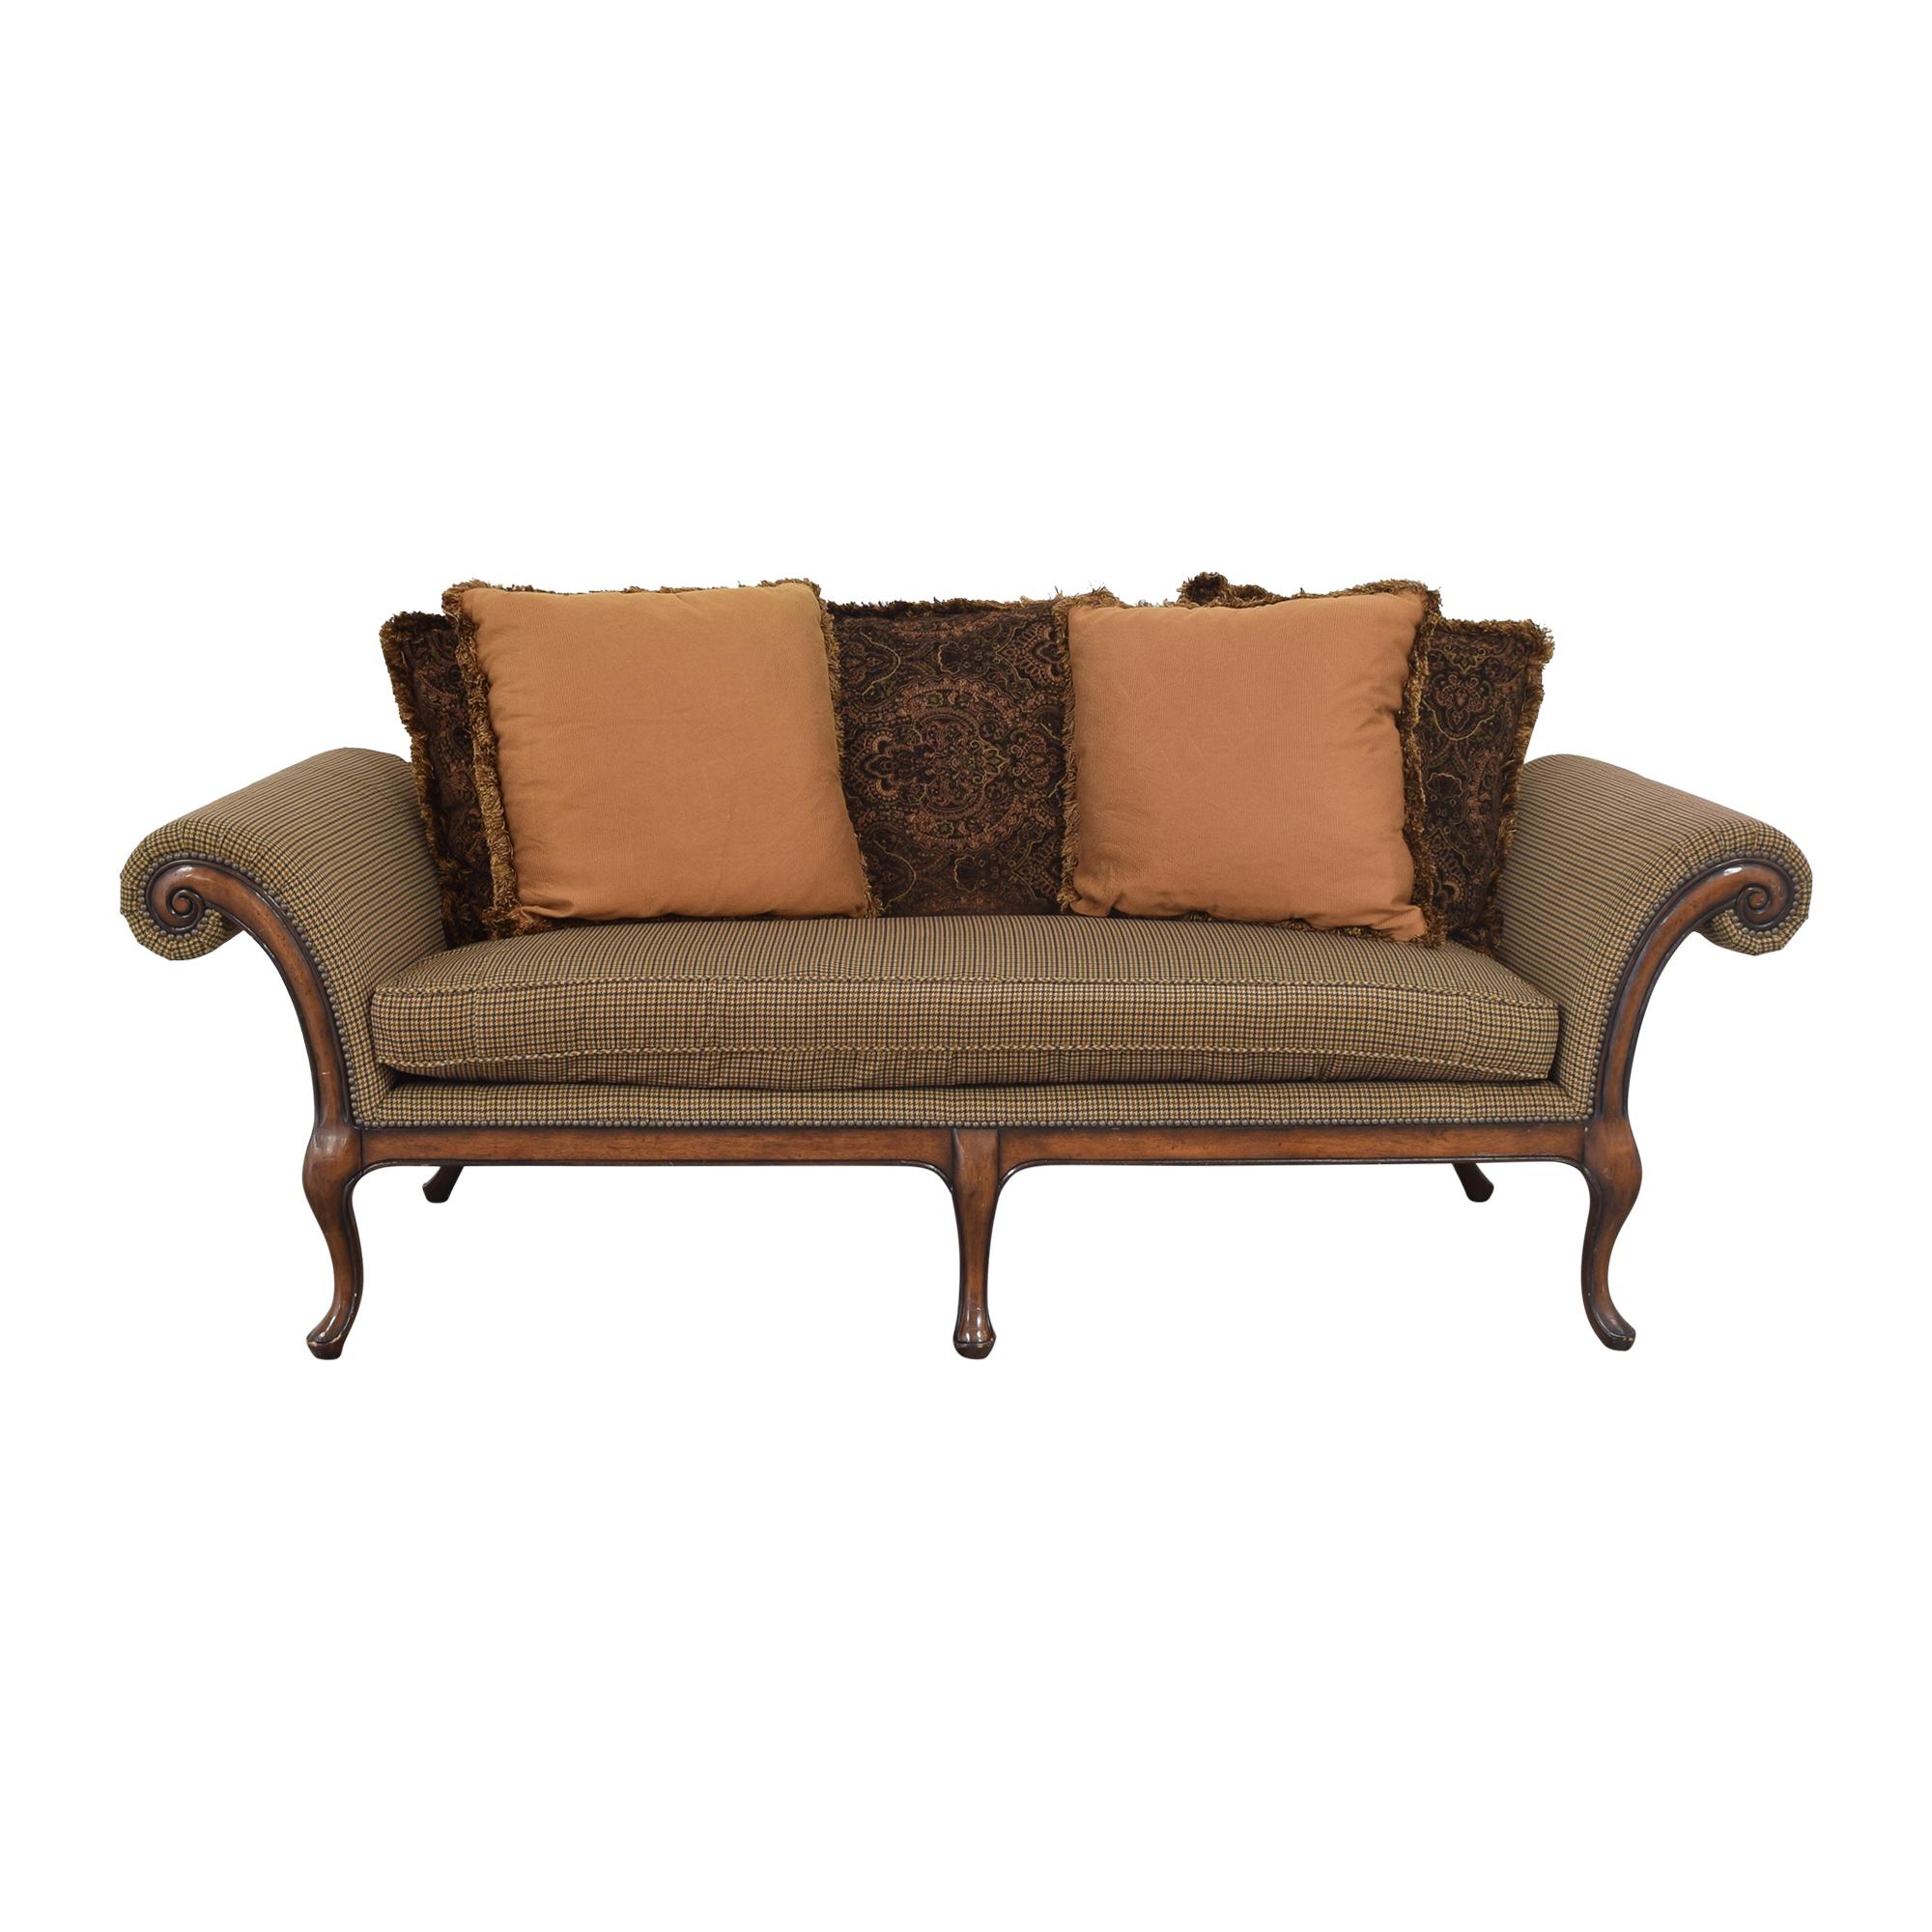 Lexington Furniture Lexington Furniture Roll Arm Sofa for sale